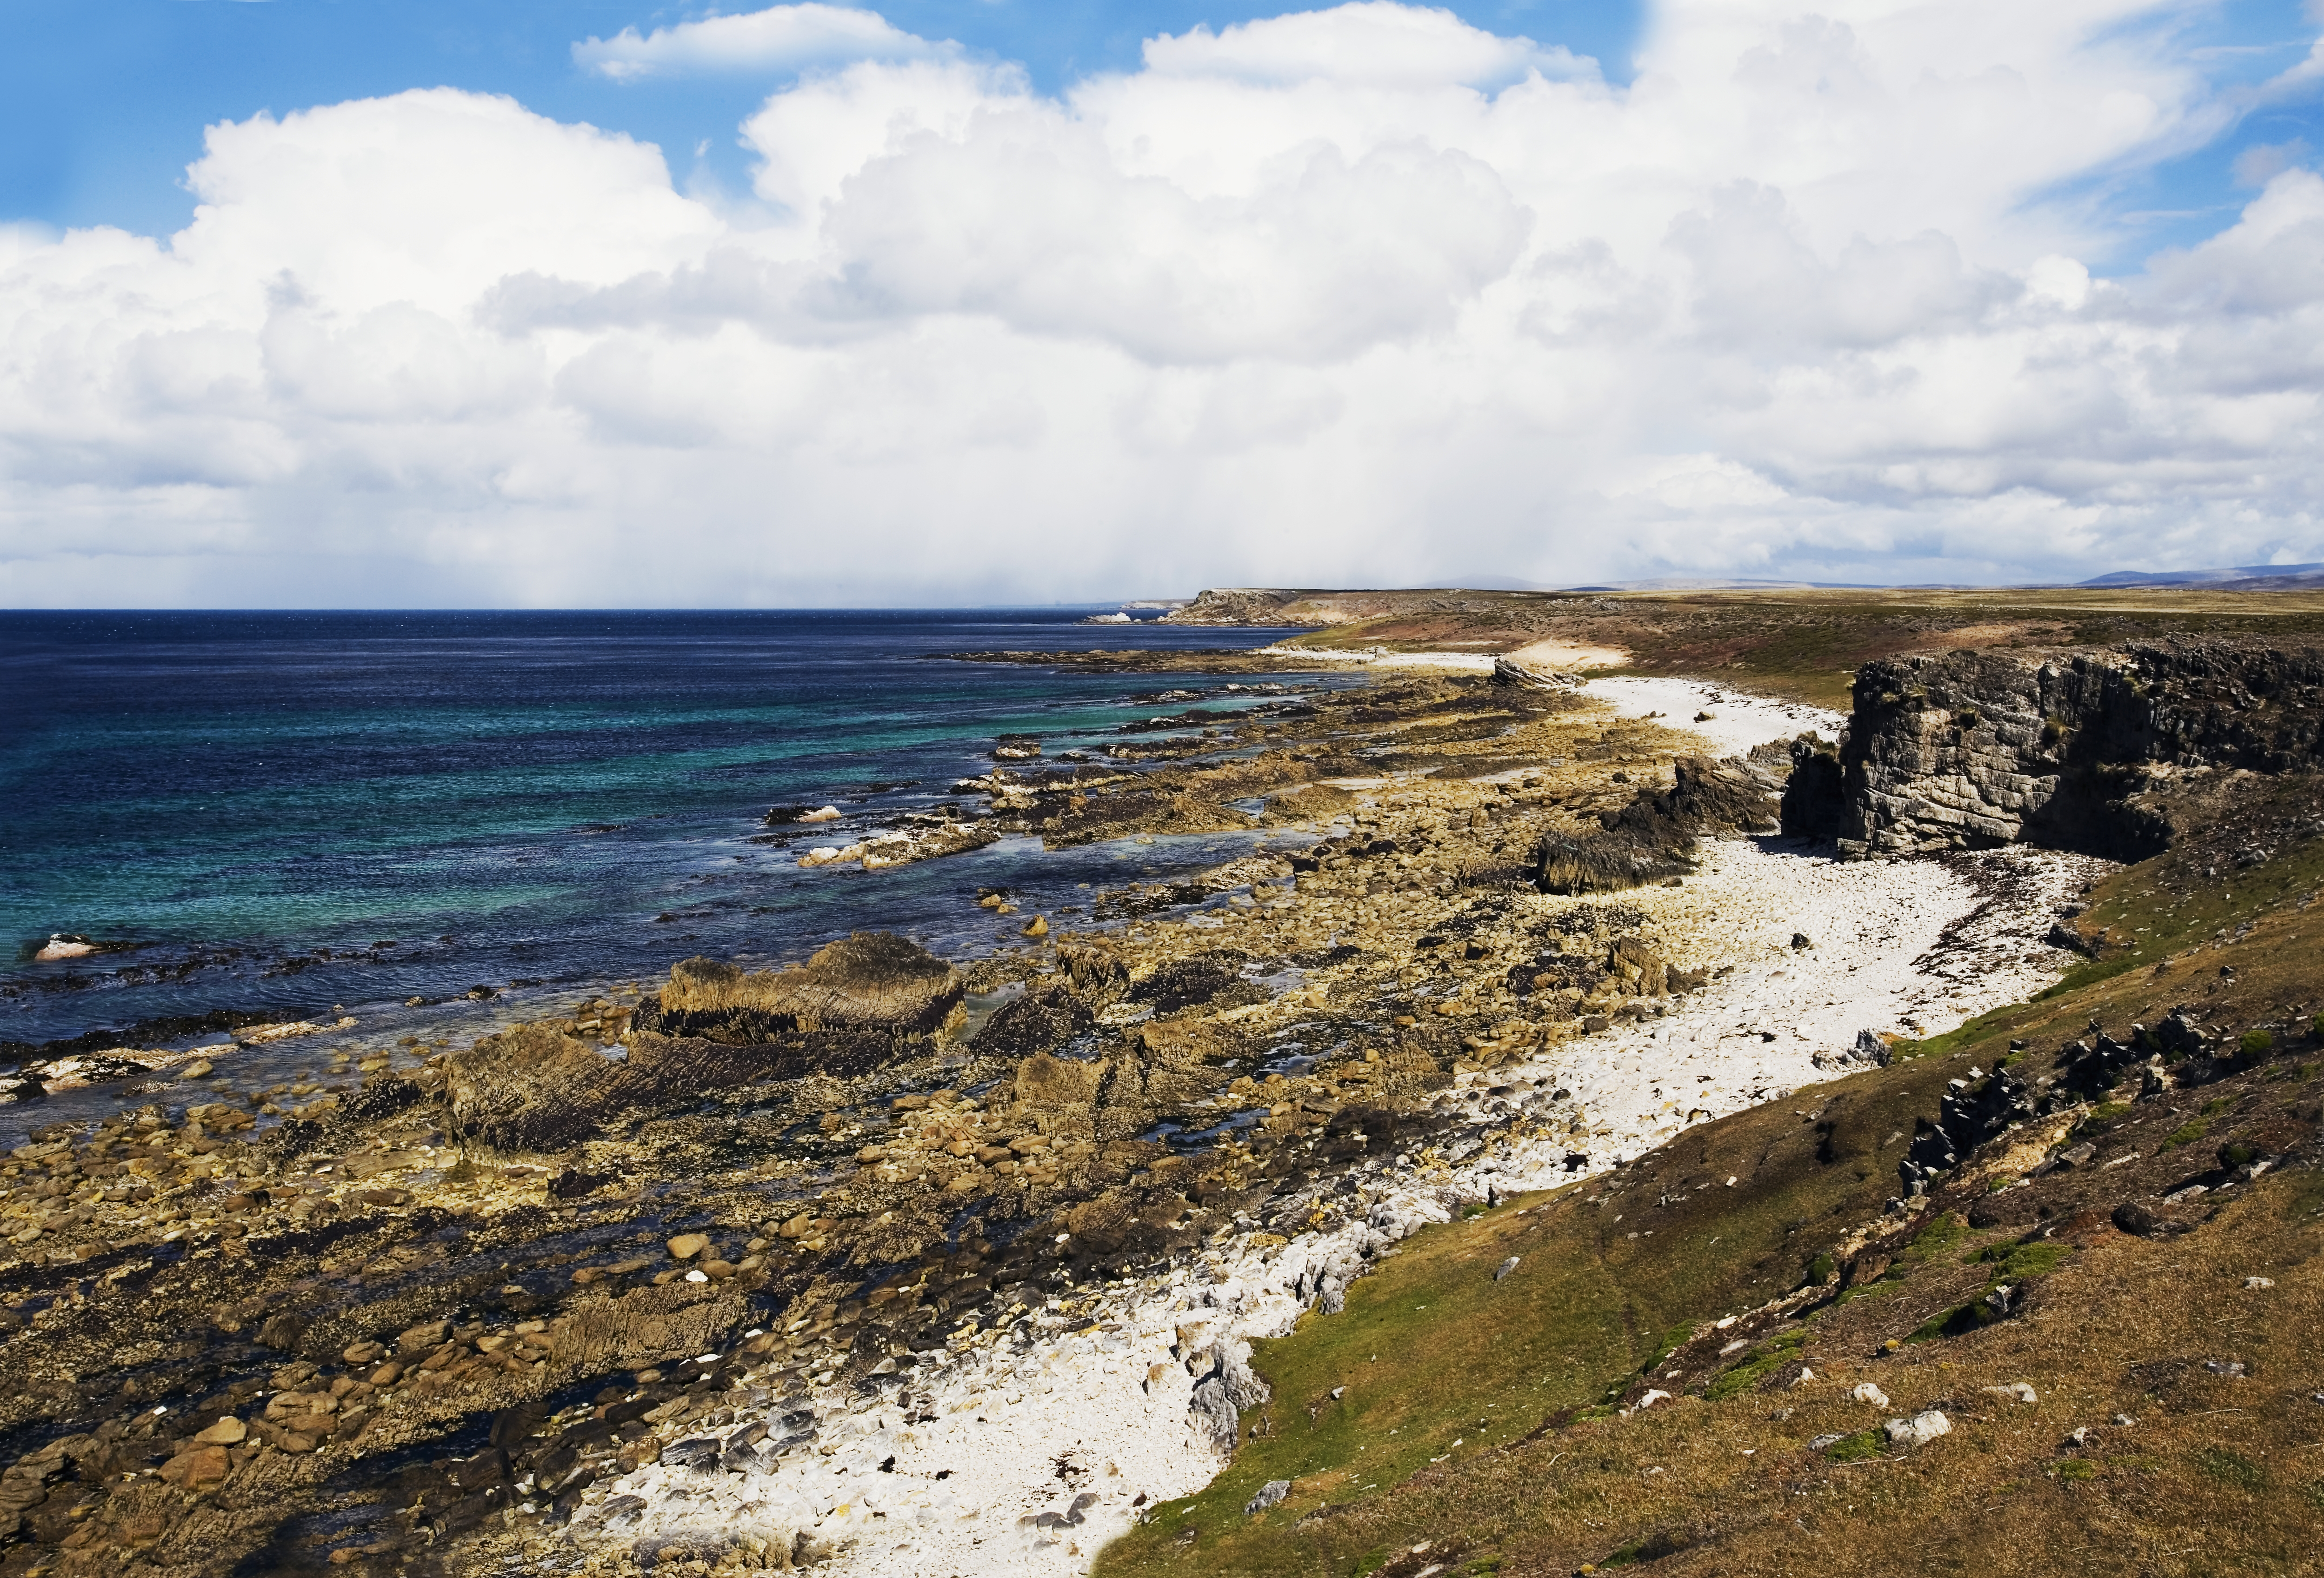 The northeast coast of Pebble Island, Falkland Islands, British Overseas Territory